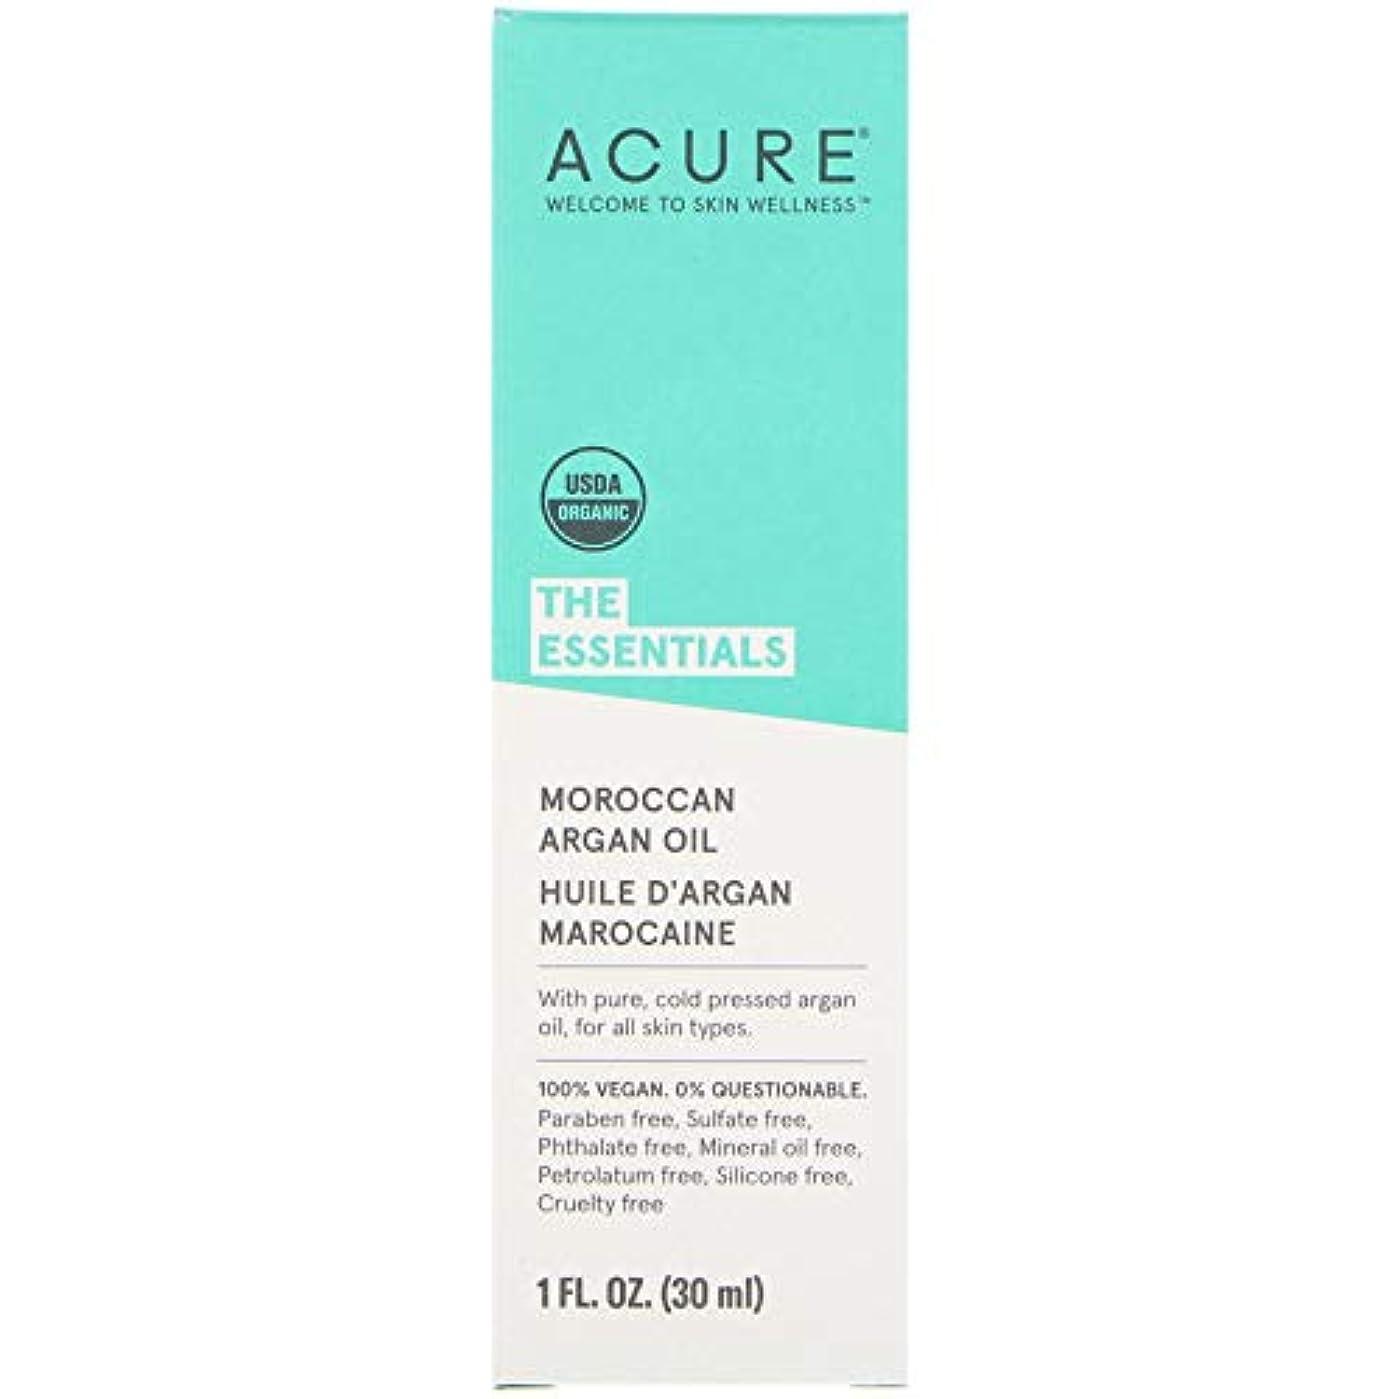 Acure Organics オーガニック モロッコ産 アルガンオイル 30ml x 3本セット [並行輸入品]